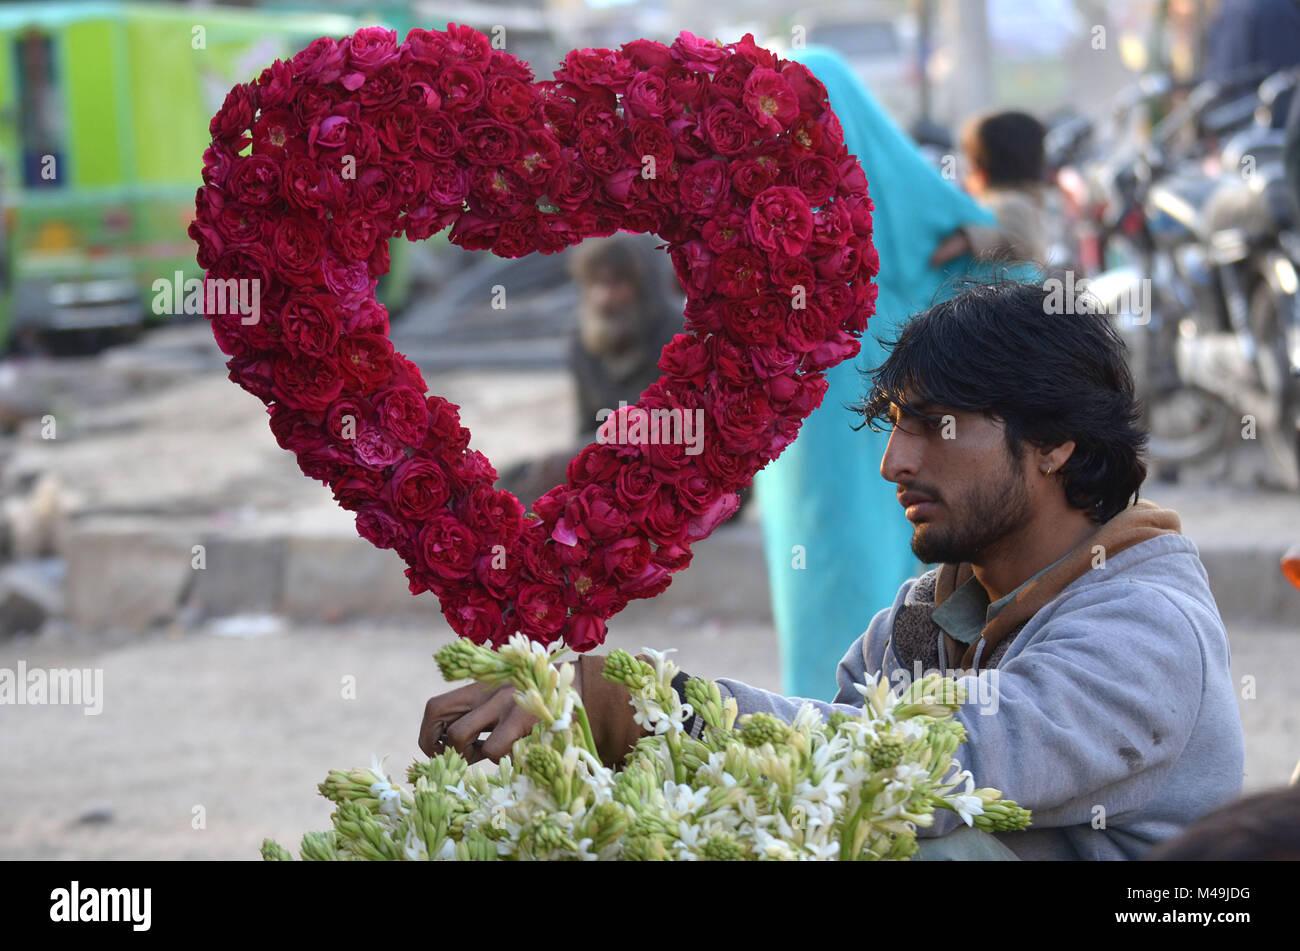 Pakistani people purchasing fresh roses flowers bouquets and pakistani people purchasing fresh roses flowers bouquets and garlands m49jdgg izmirmasajfo Images